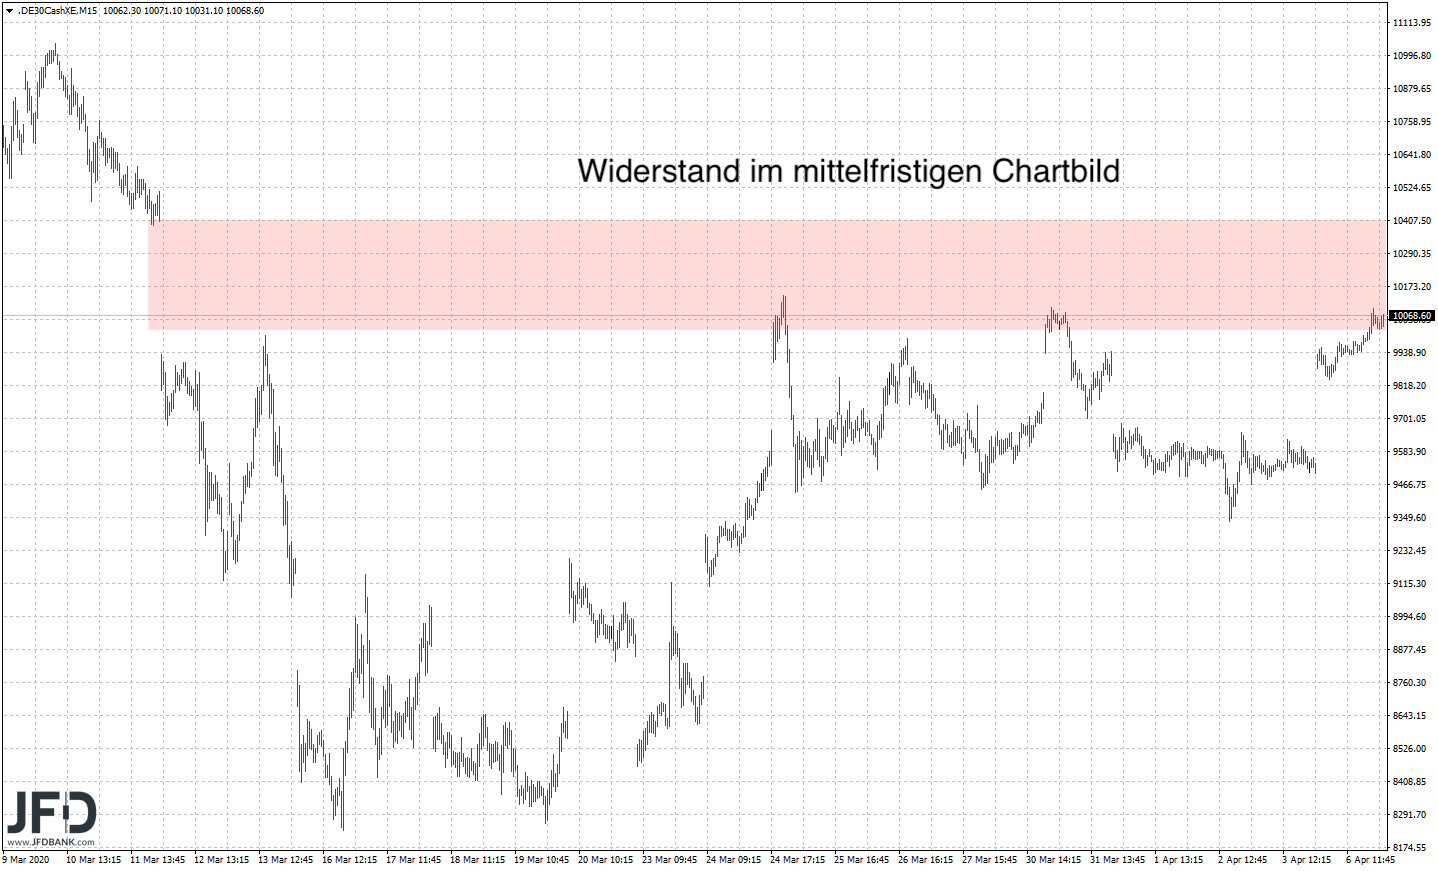 Starke-Vorosterzeit-DAX-schafft-Rückeroberung-der-10-000-Kommentar-JFD-Bank-GodmodeTrader.de-8